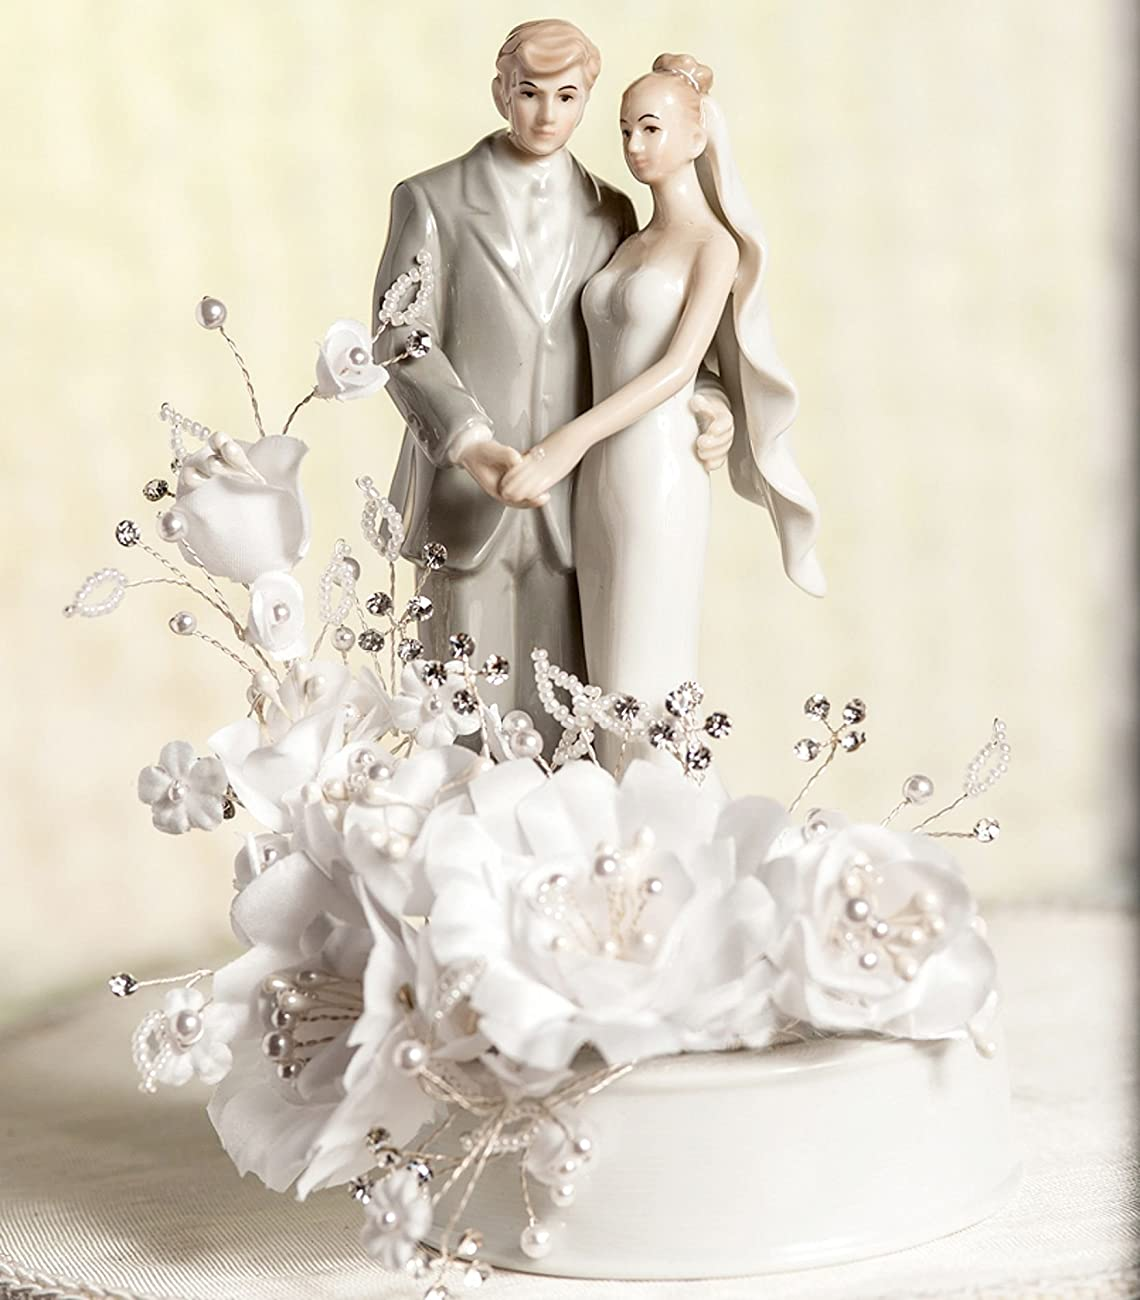 Vintage Bride and Groom Wedding Cake Topper 0